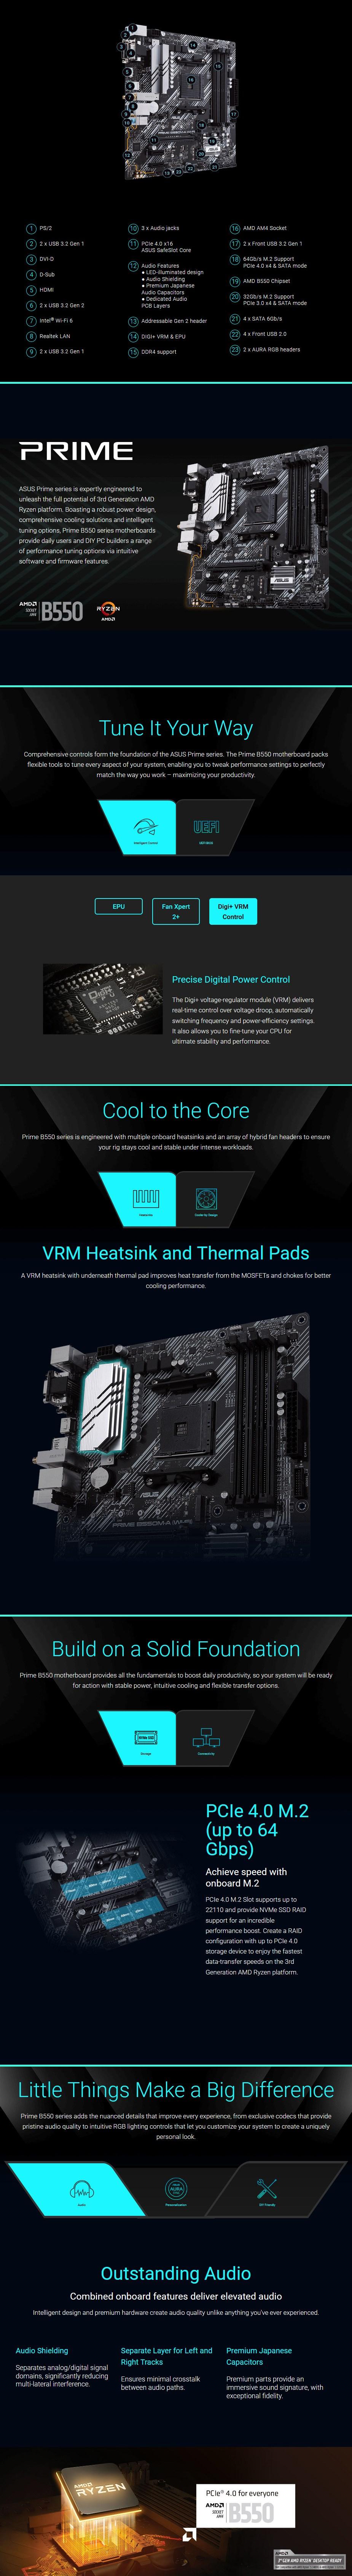 asus-prime-b550ma-wifi-am4-microatx-motherboard-ac35550-4.jpg